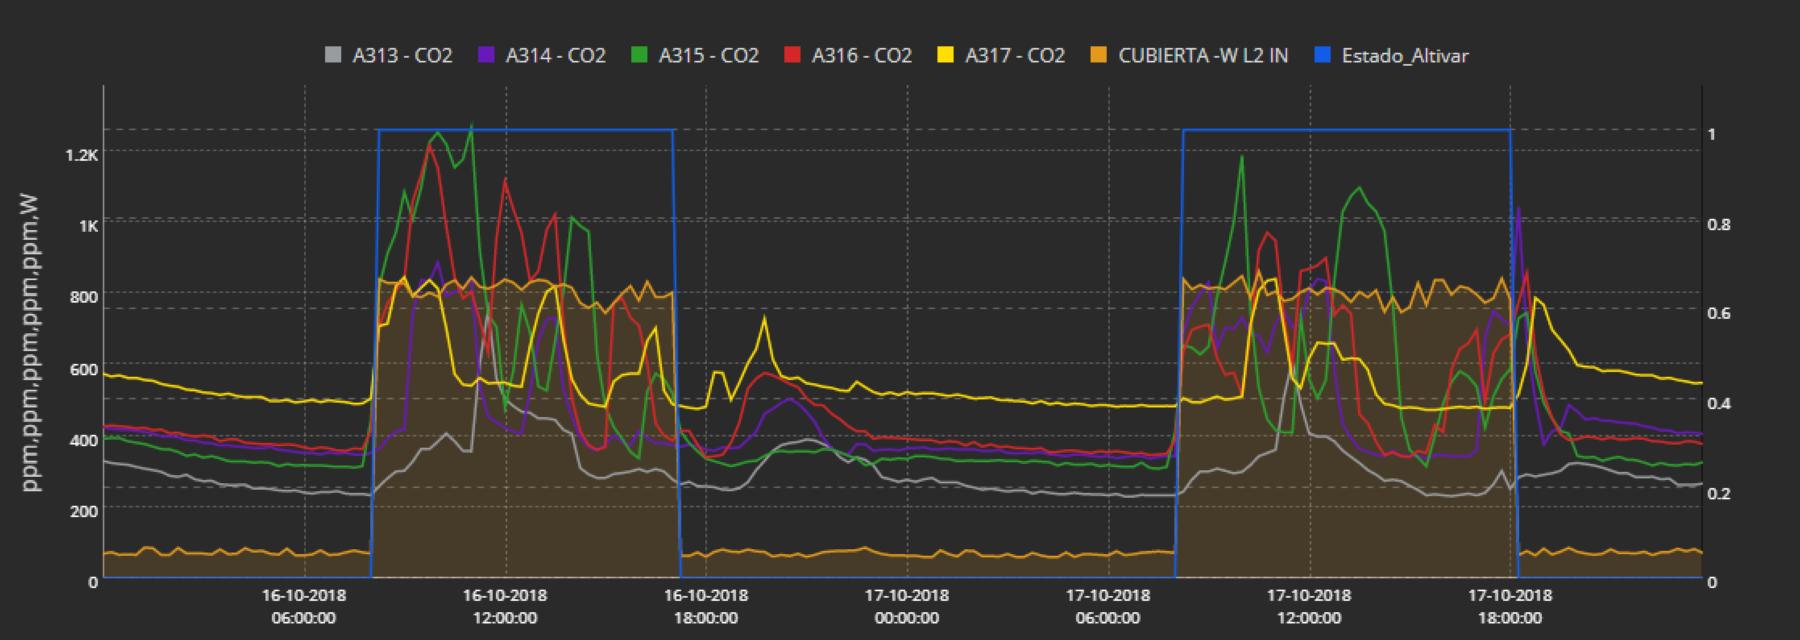 https://www.advanticsys.com/wp-content/uploads/2020/11/EscuelaP-concordia-vent-VS-CO2.png